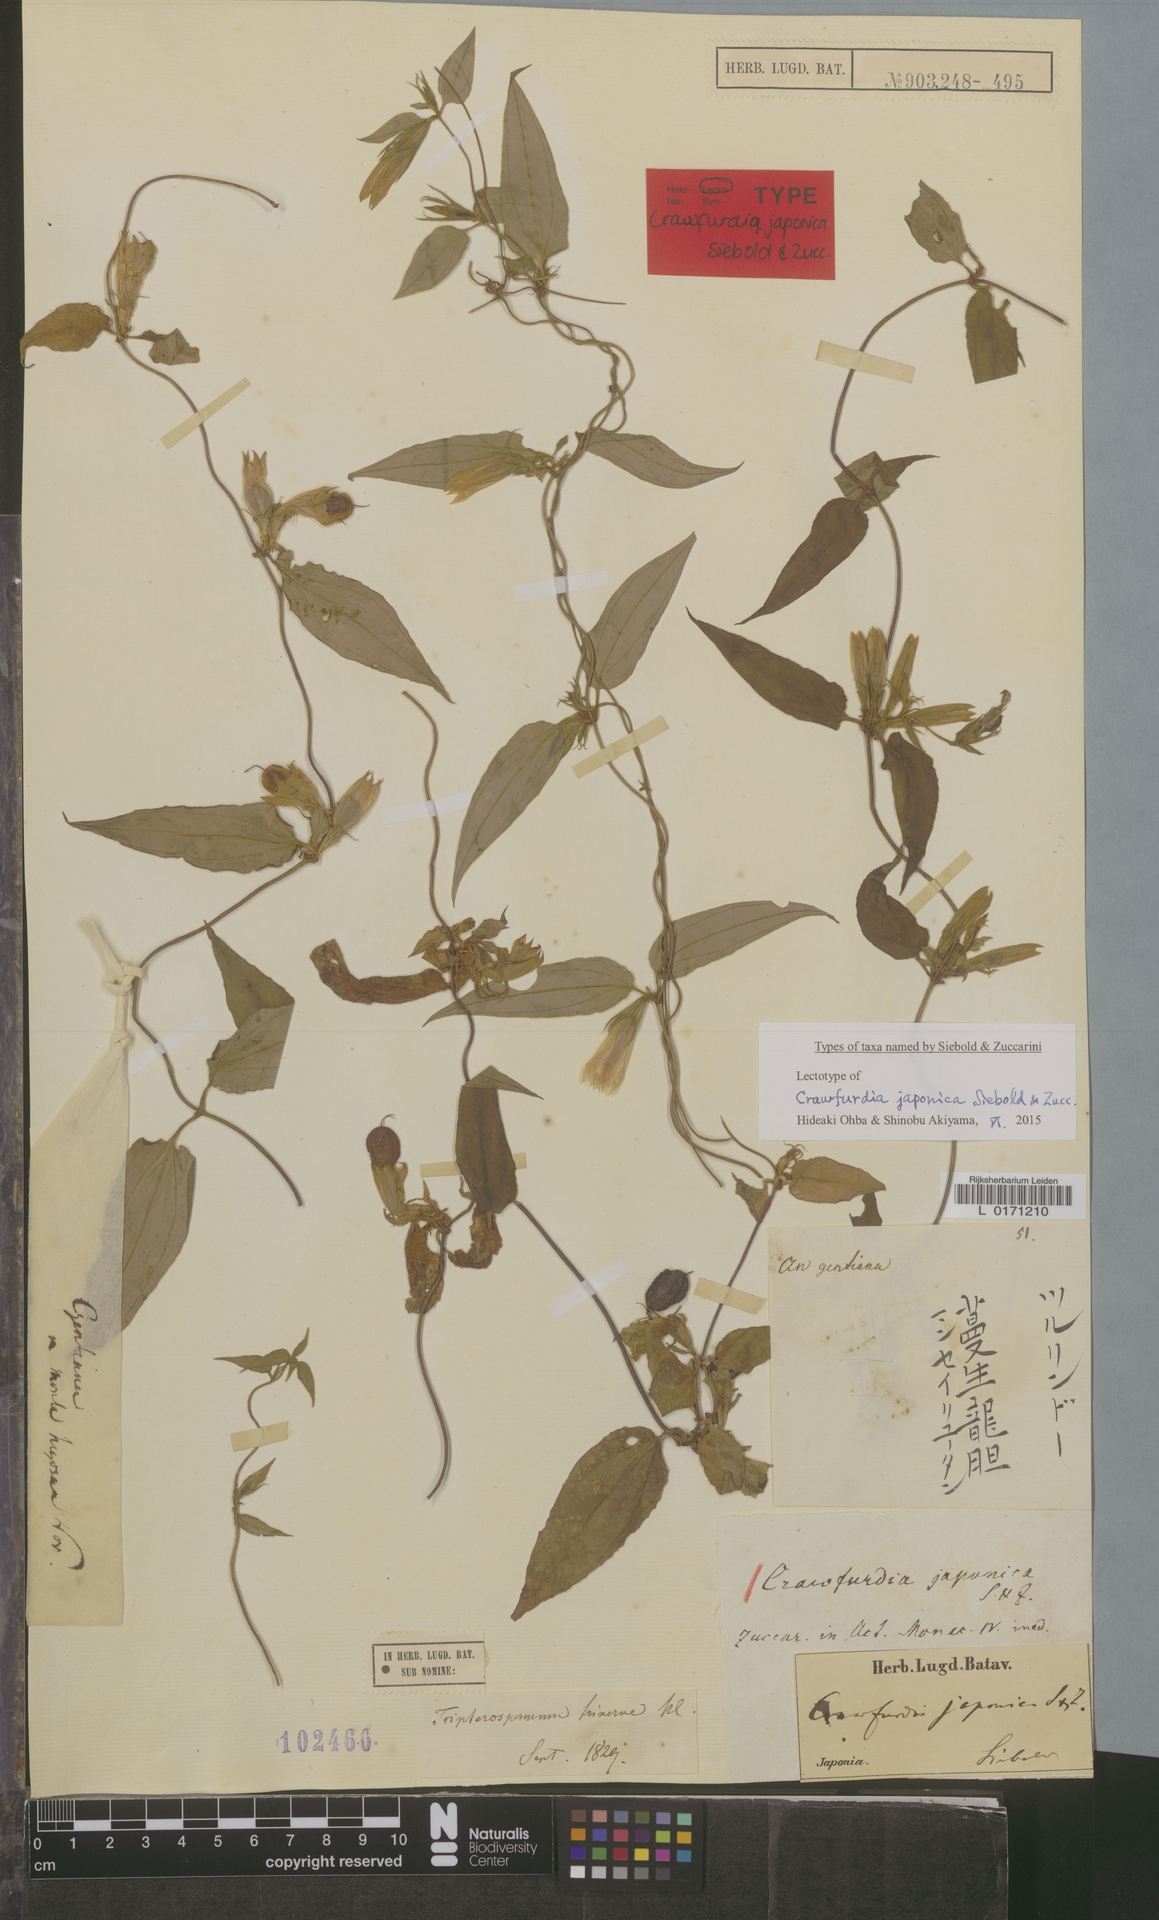 L  0171210 | Crawfurdia japonica Siebold & Zucc.